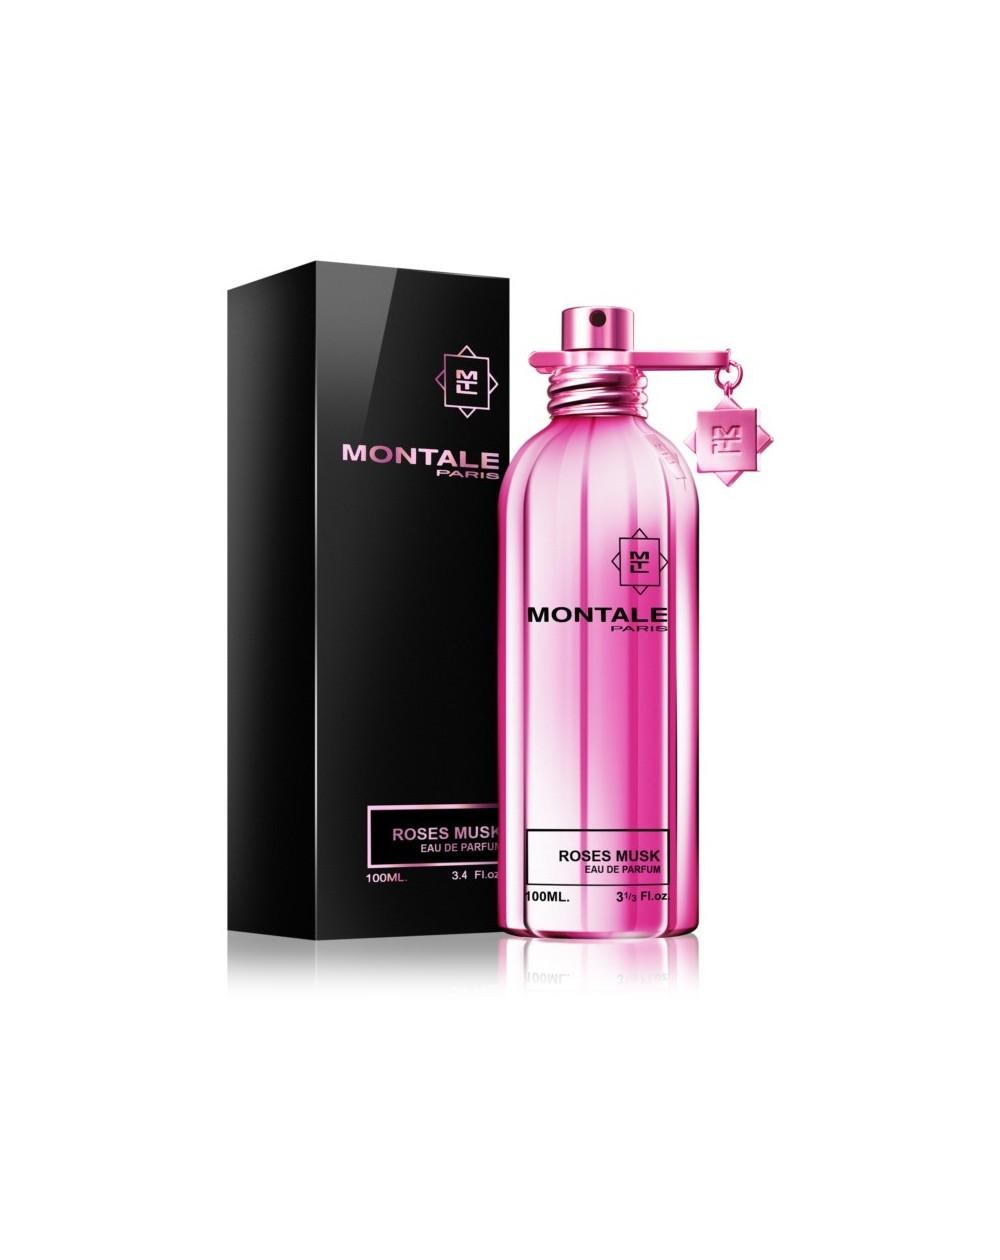 montale-roses-musk-eau-de-parfum.jpg 100ml sp